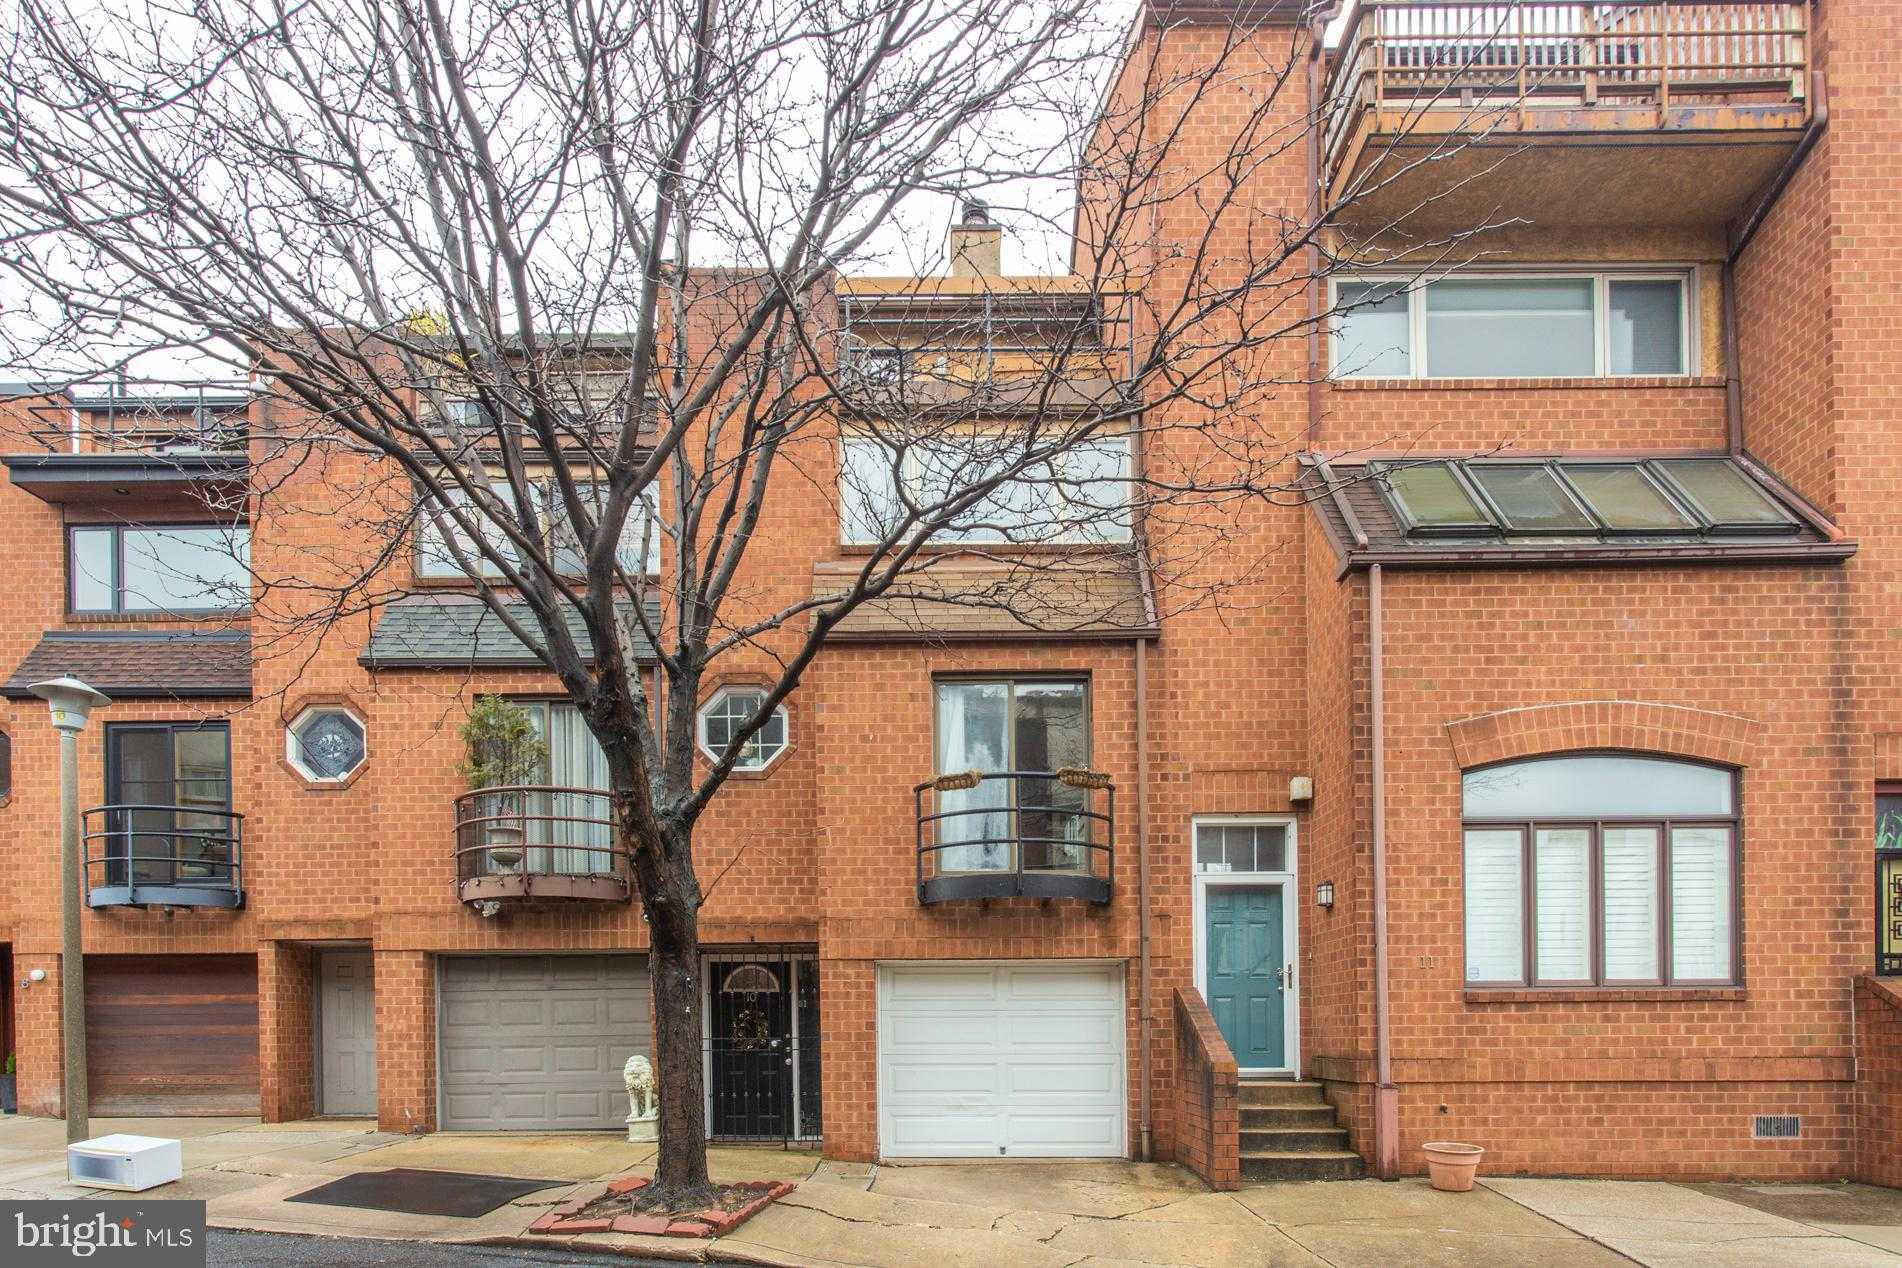 $625,000 - 3Br/3Ba -  for Sale in Queen Village, Philadelphia